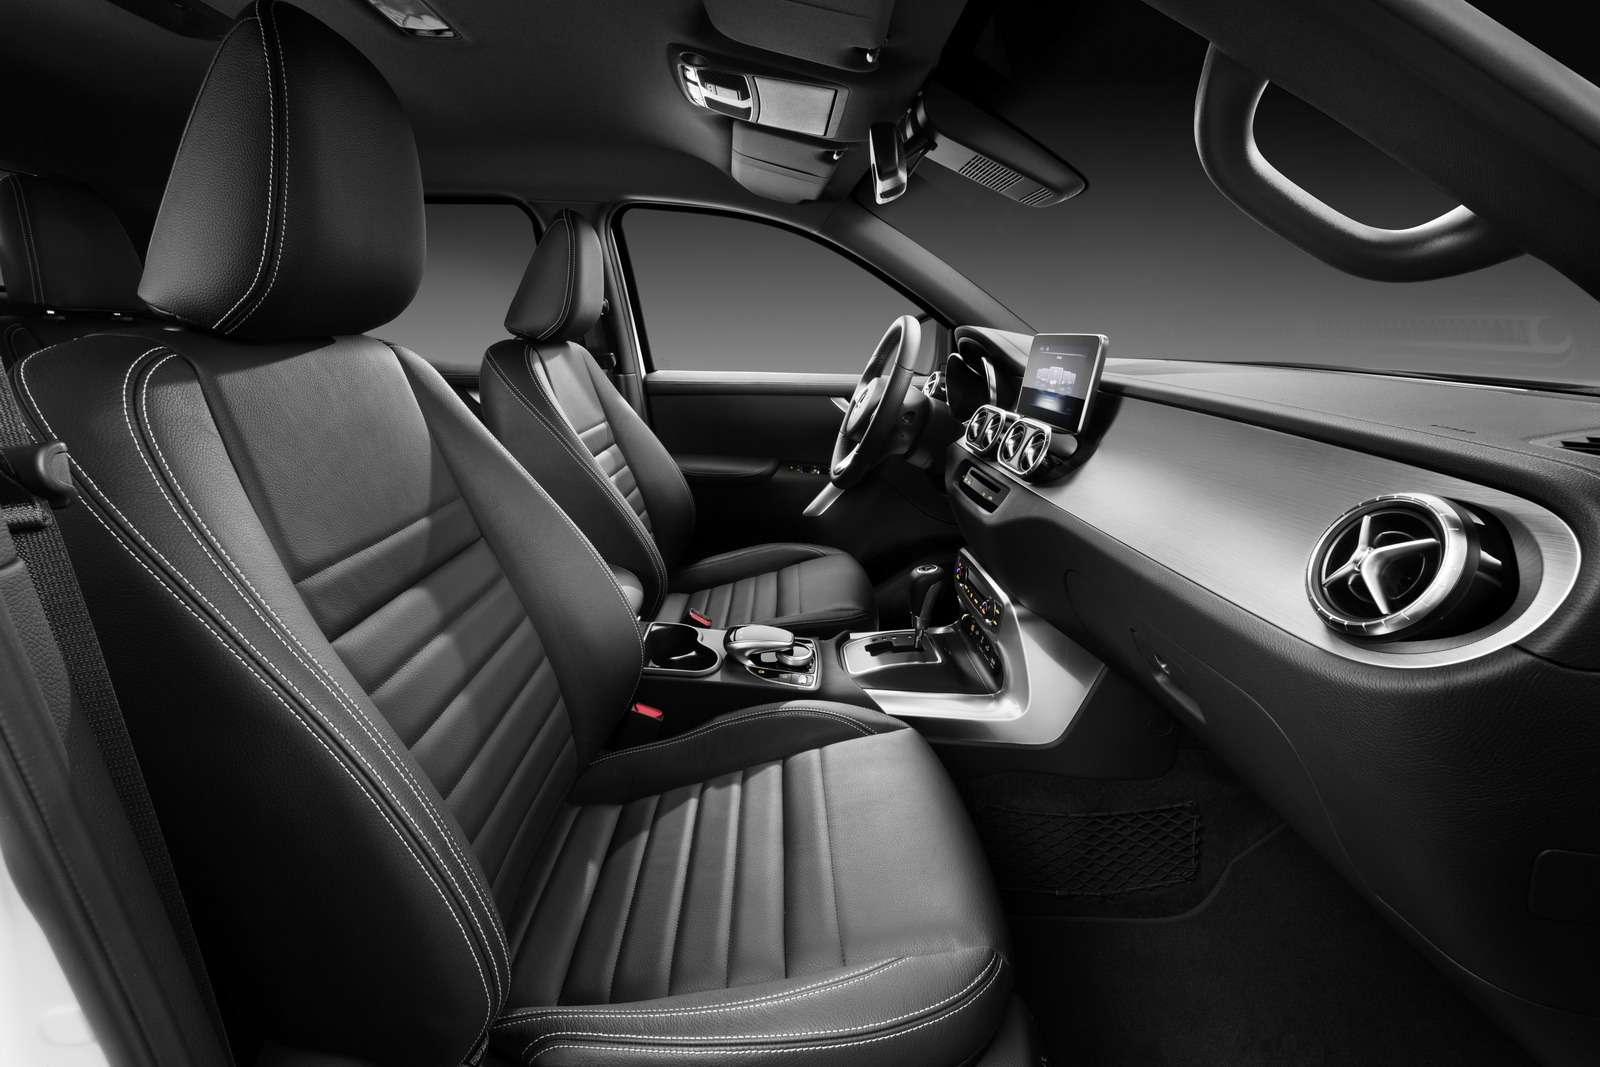 Mercedes-Benz привез вРоссию Х-класс: грузовик поцене дорогого кроссовера— фото 776021